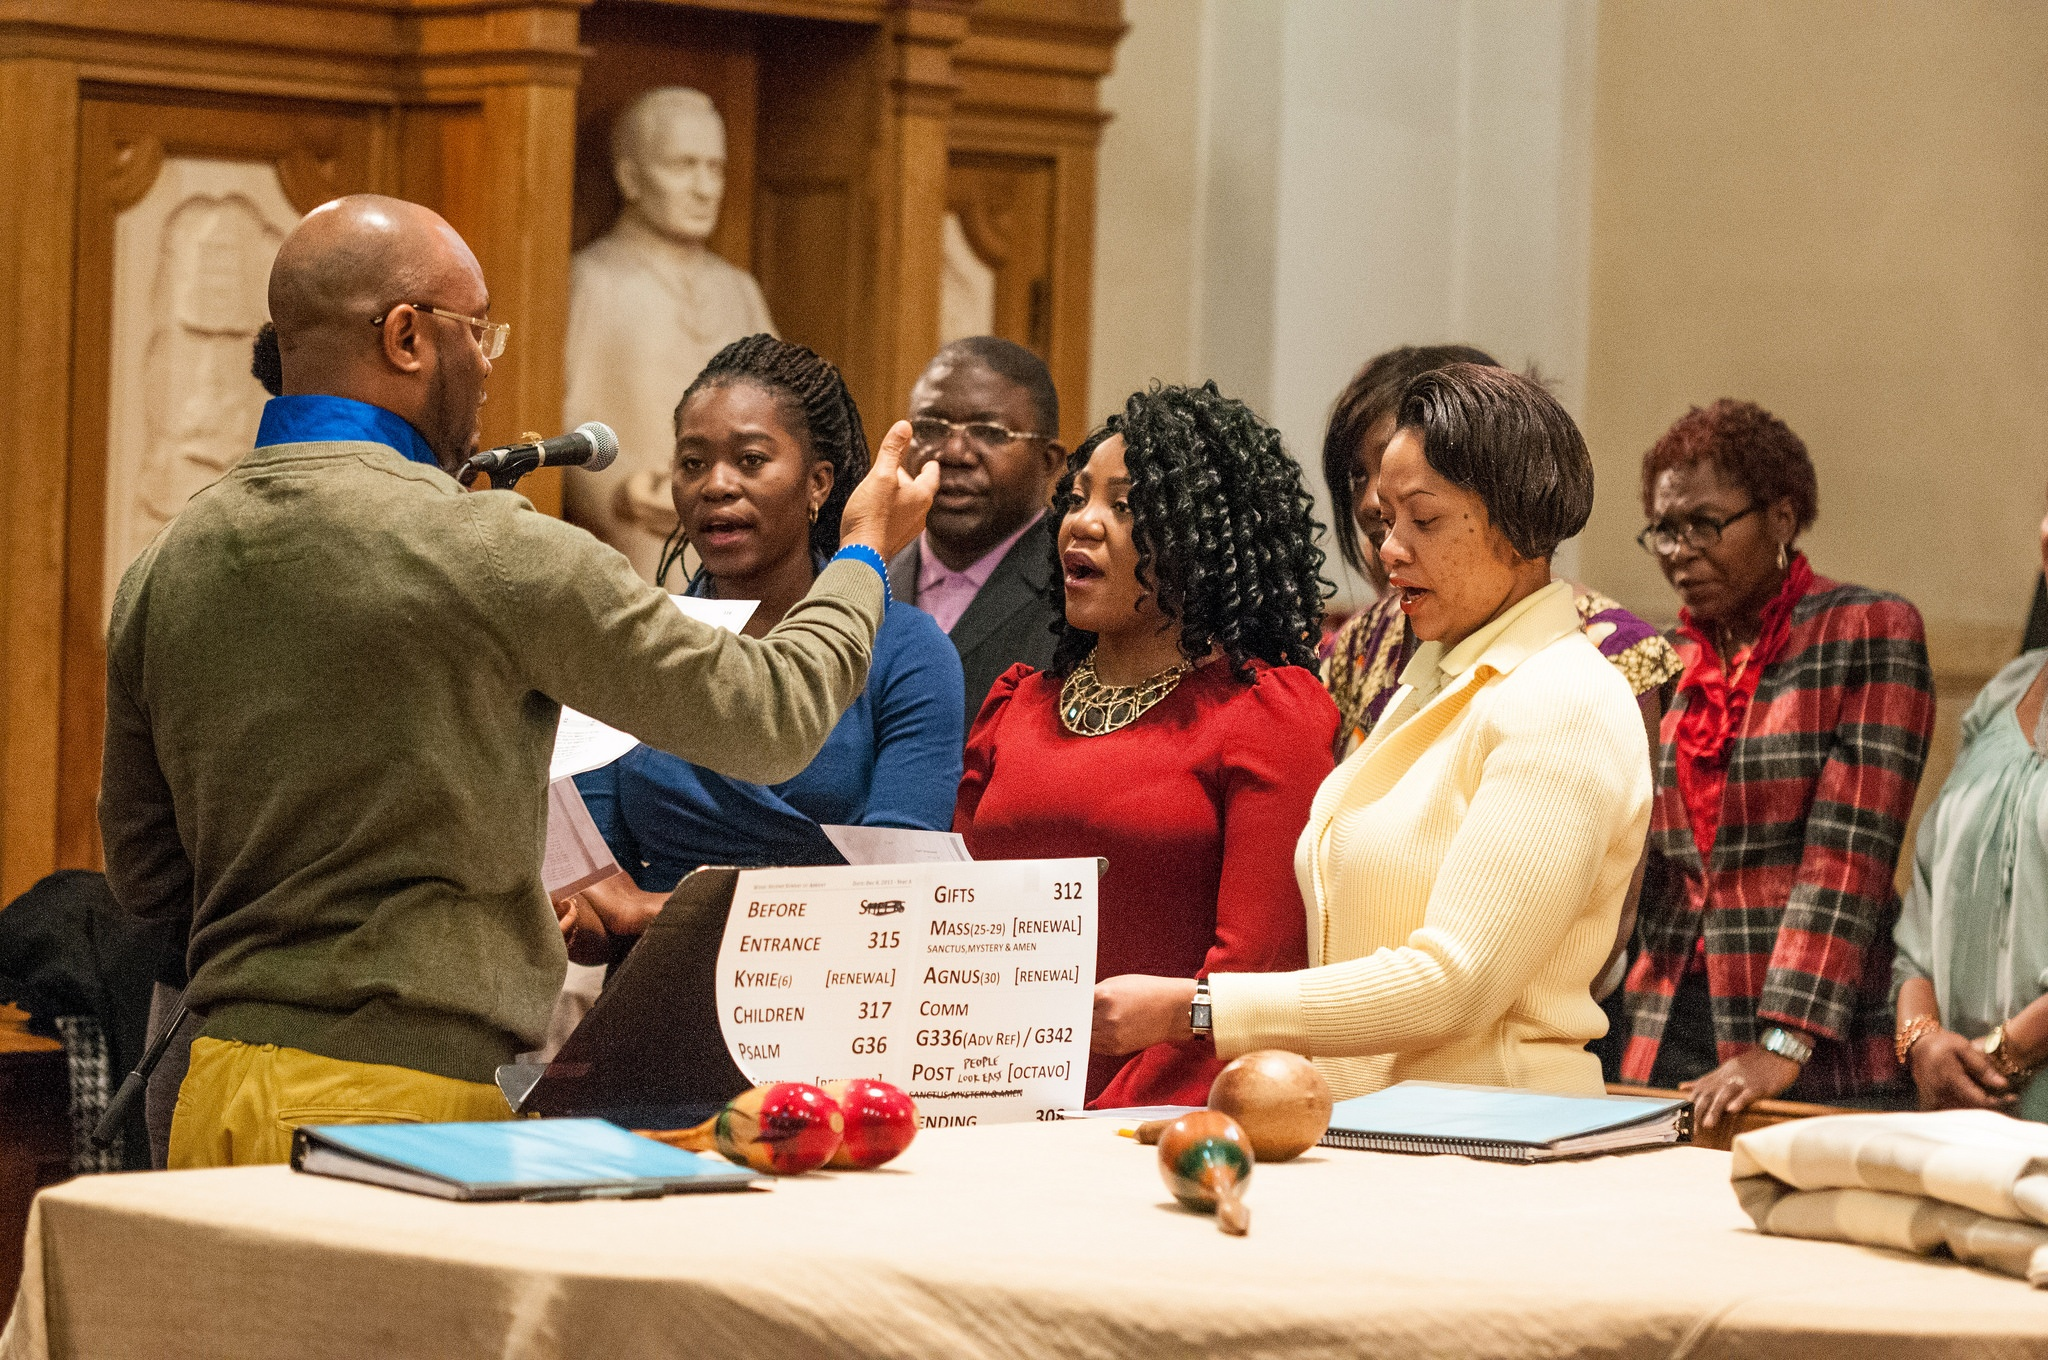 A worship leader leads the choir